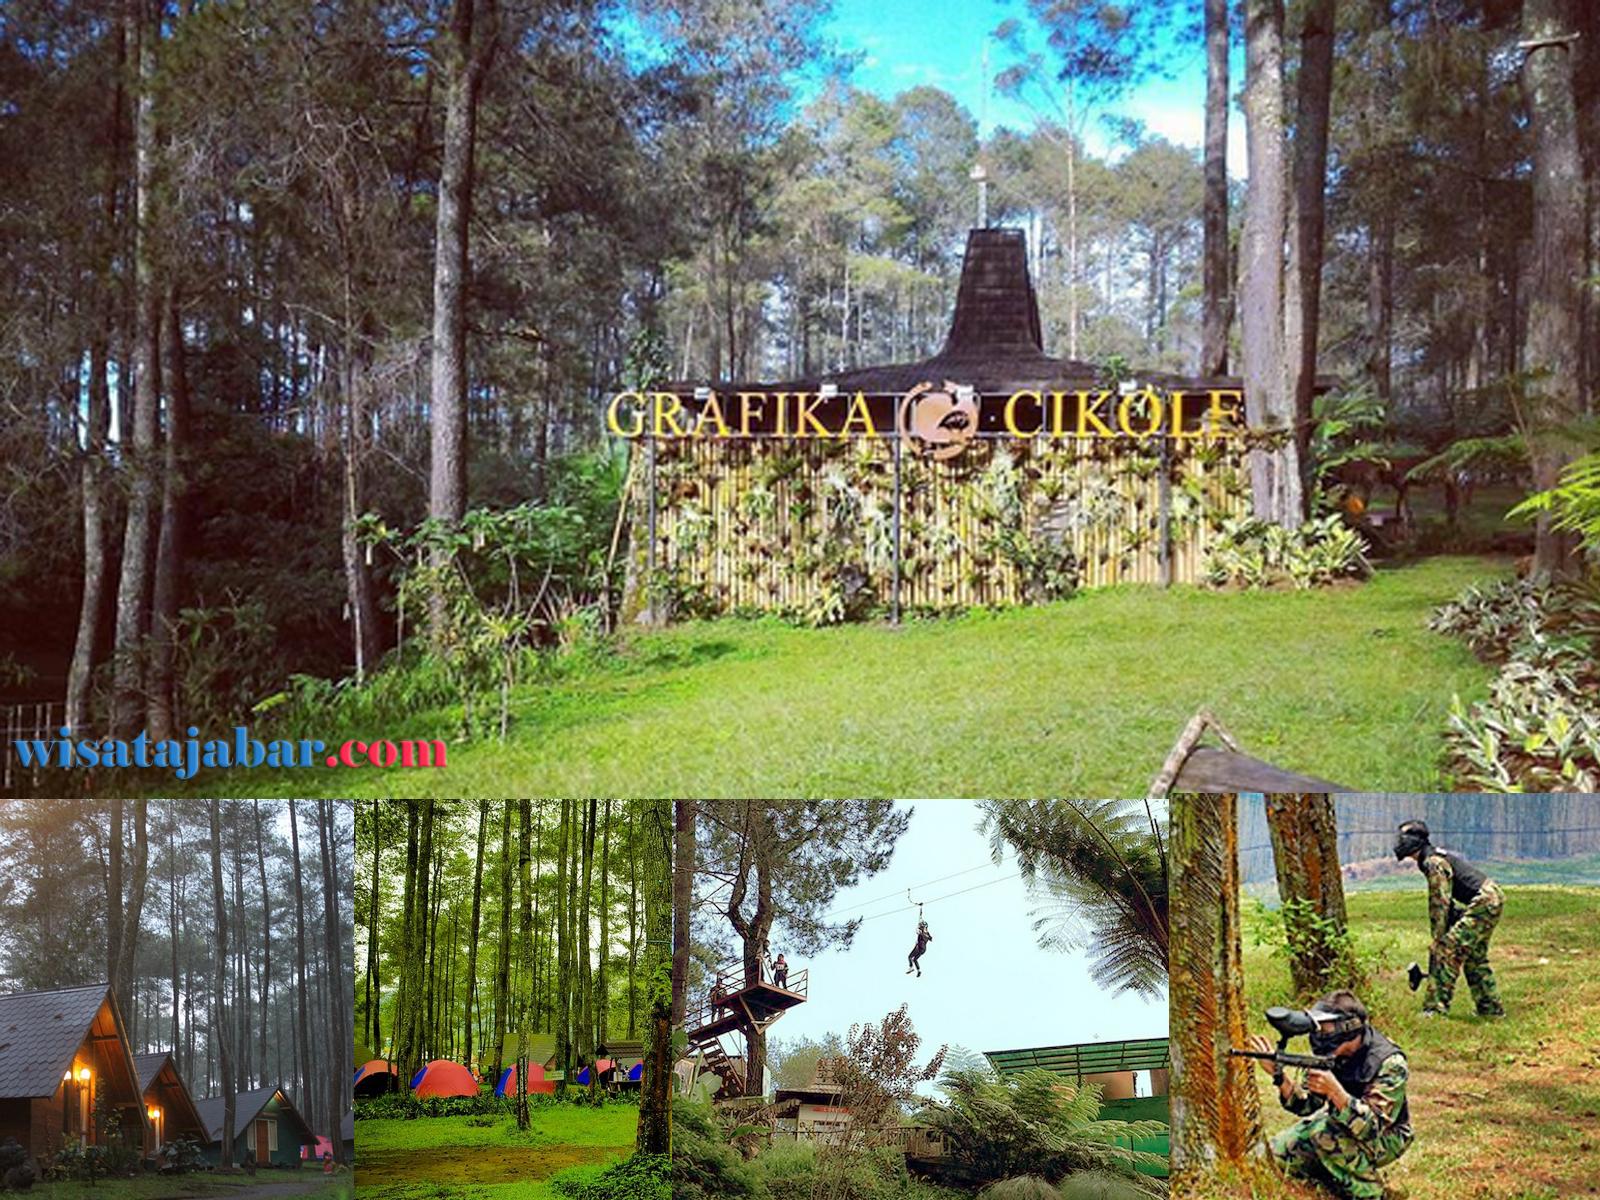 inilah kawasan wisata alam di daerah lembang yang menjadi favorit wisatawan terminal wisata grafika cikole memang menyajikan konsep terpadu